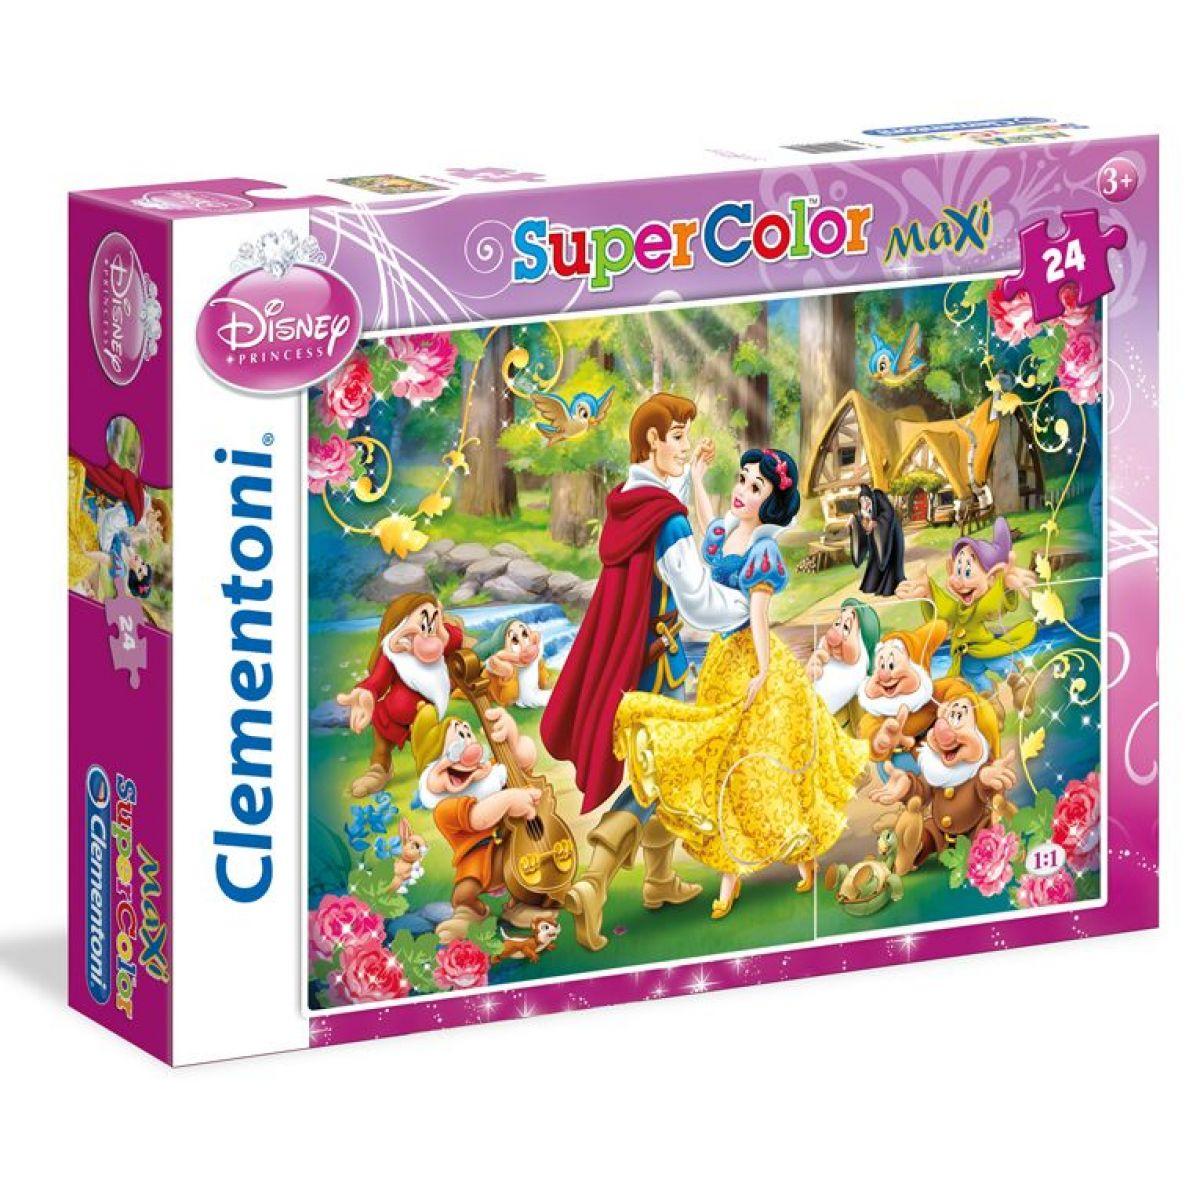 Clementoni Sněhurka Supercolor Maxi Puzzle 24 dílky